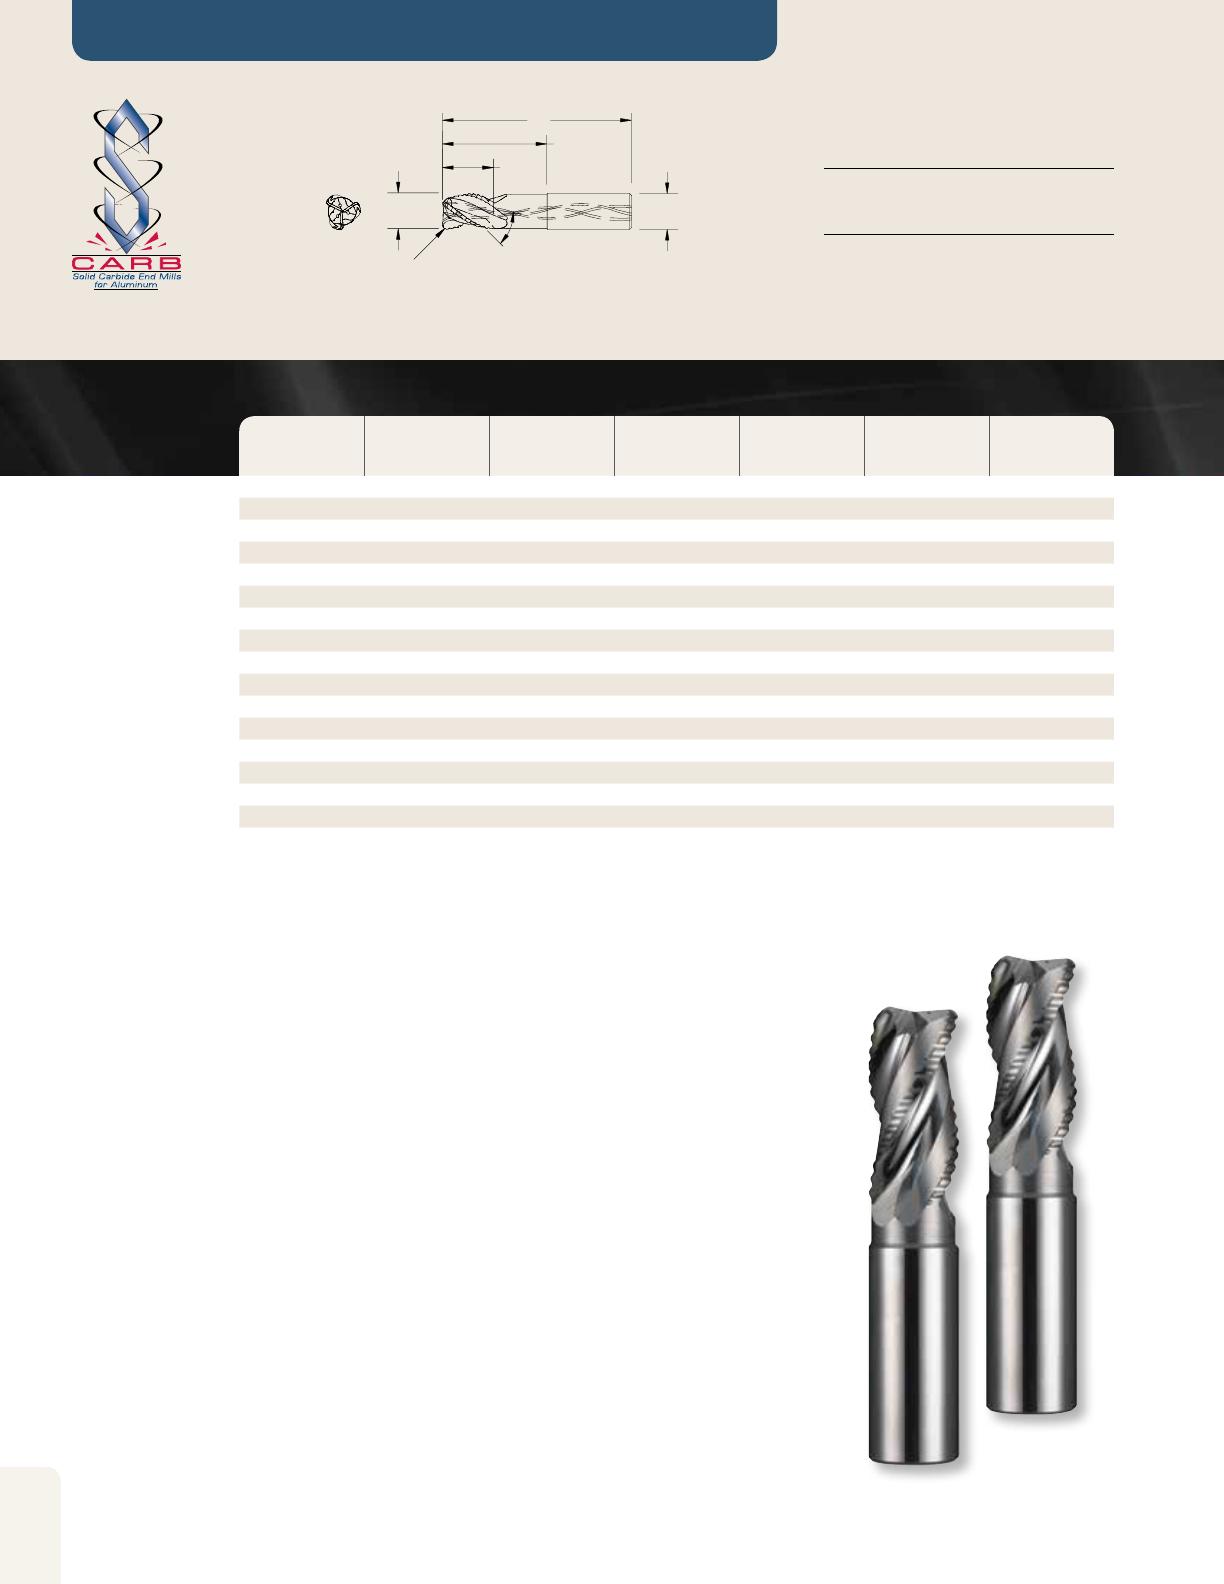 SGS 34787 43CR S-Carb High Performance End Mill 3//4 Cutting Diameter 1-5//8 Cutting Length 0.090 Corner Radius 4 Length Uncoated 3//4 Shank Diameter